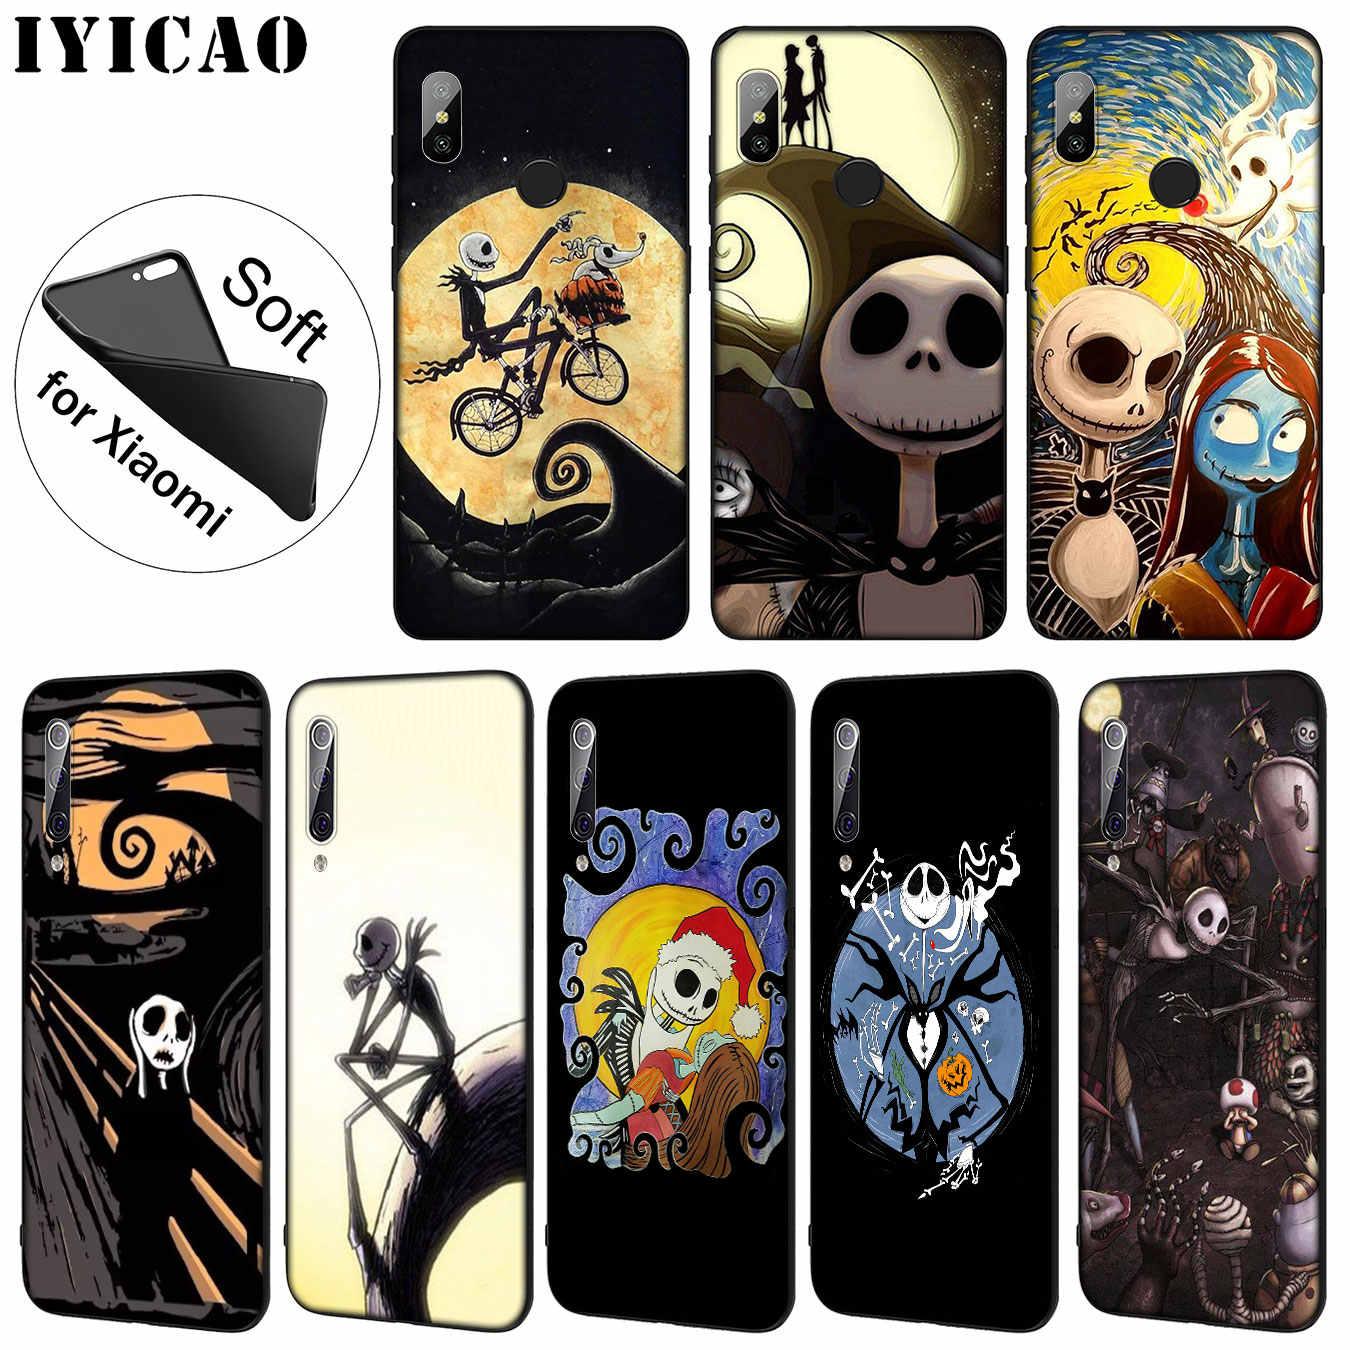 Мягкий чехол для телефона IYICAO nightbe Tim burton на Хэллоуин для Xiaomi Mi 9 SE 9T CC9 CC9E 8 A3 Pro A1 A2 Lite pocophone f1 MAX 3